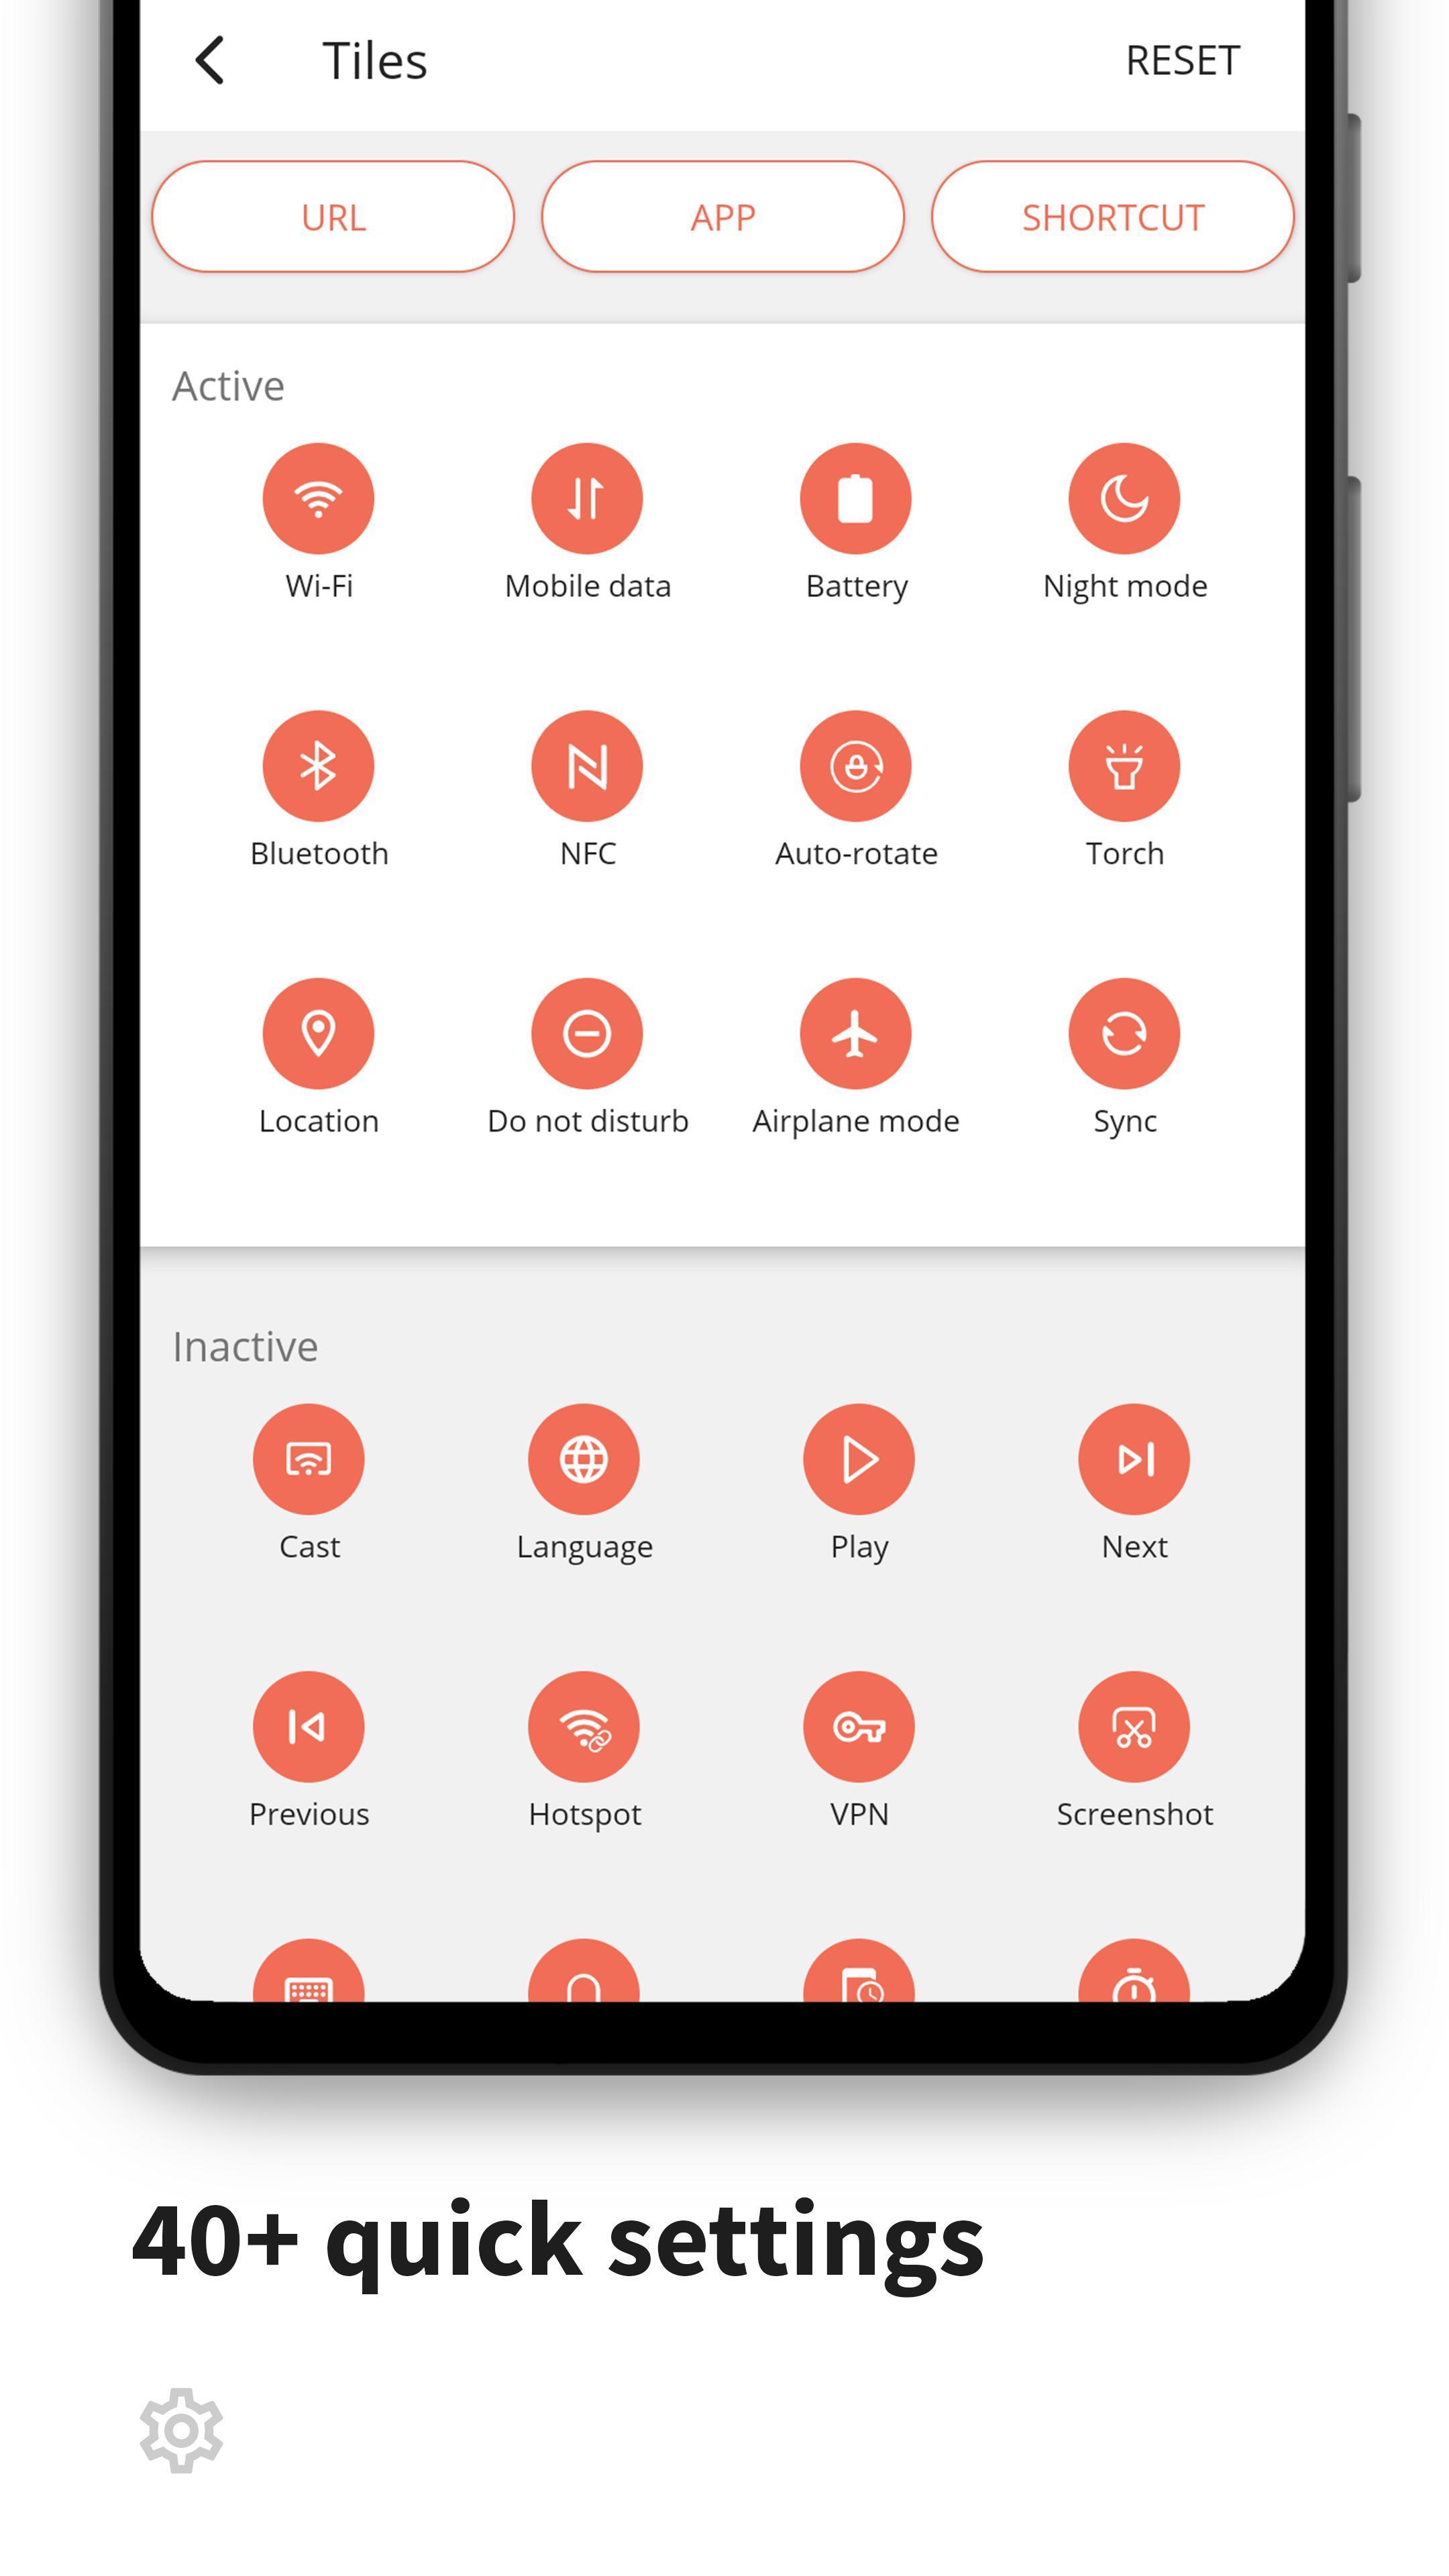 MIUI-ify Notification Shade & Quick Settings 1.7.0 Screenshot 12